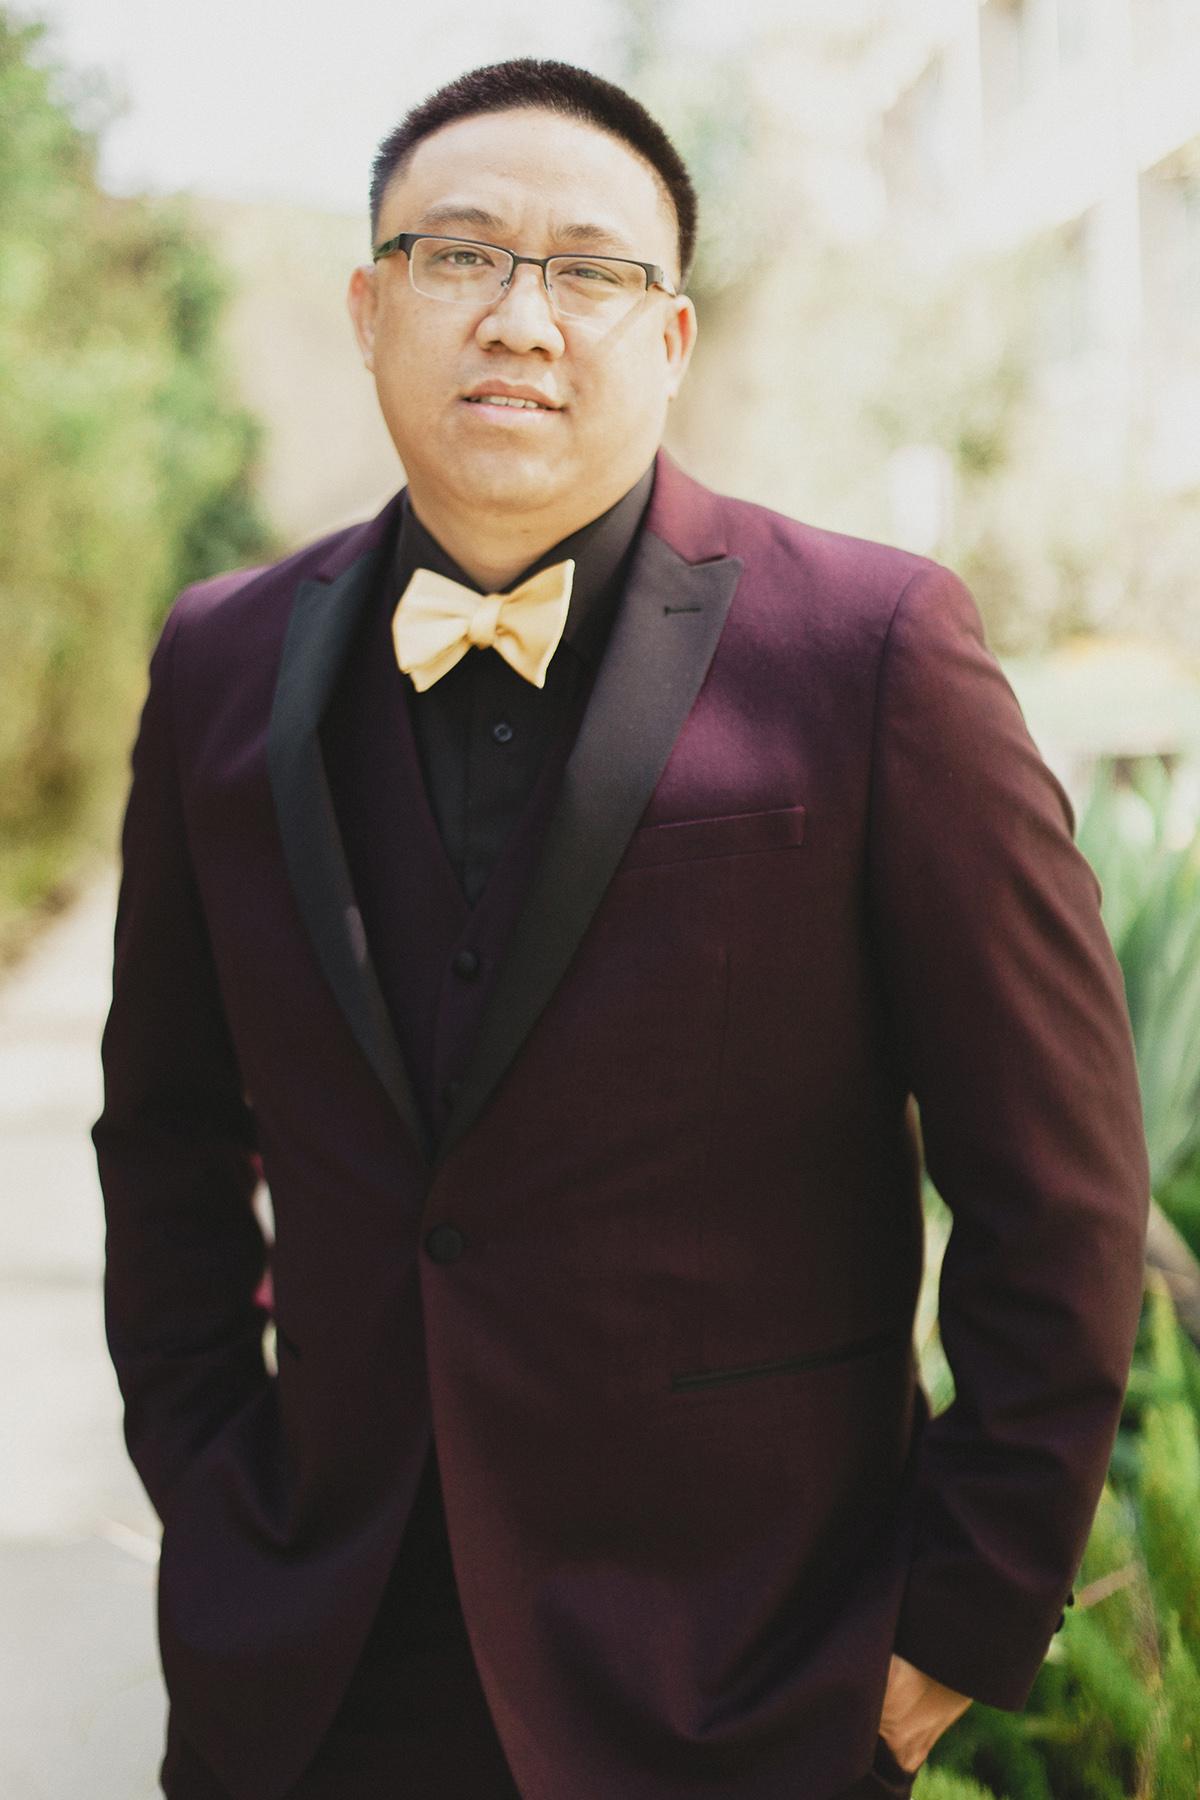 amy_jas_wedding-012.jpg